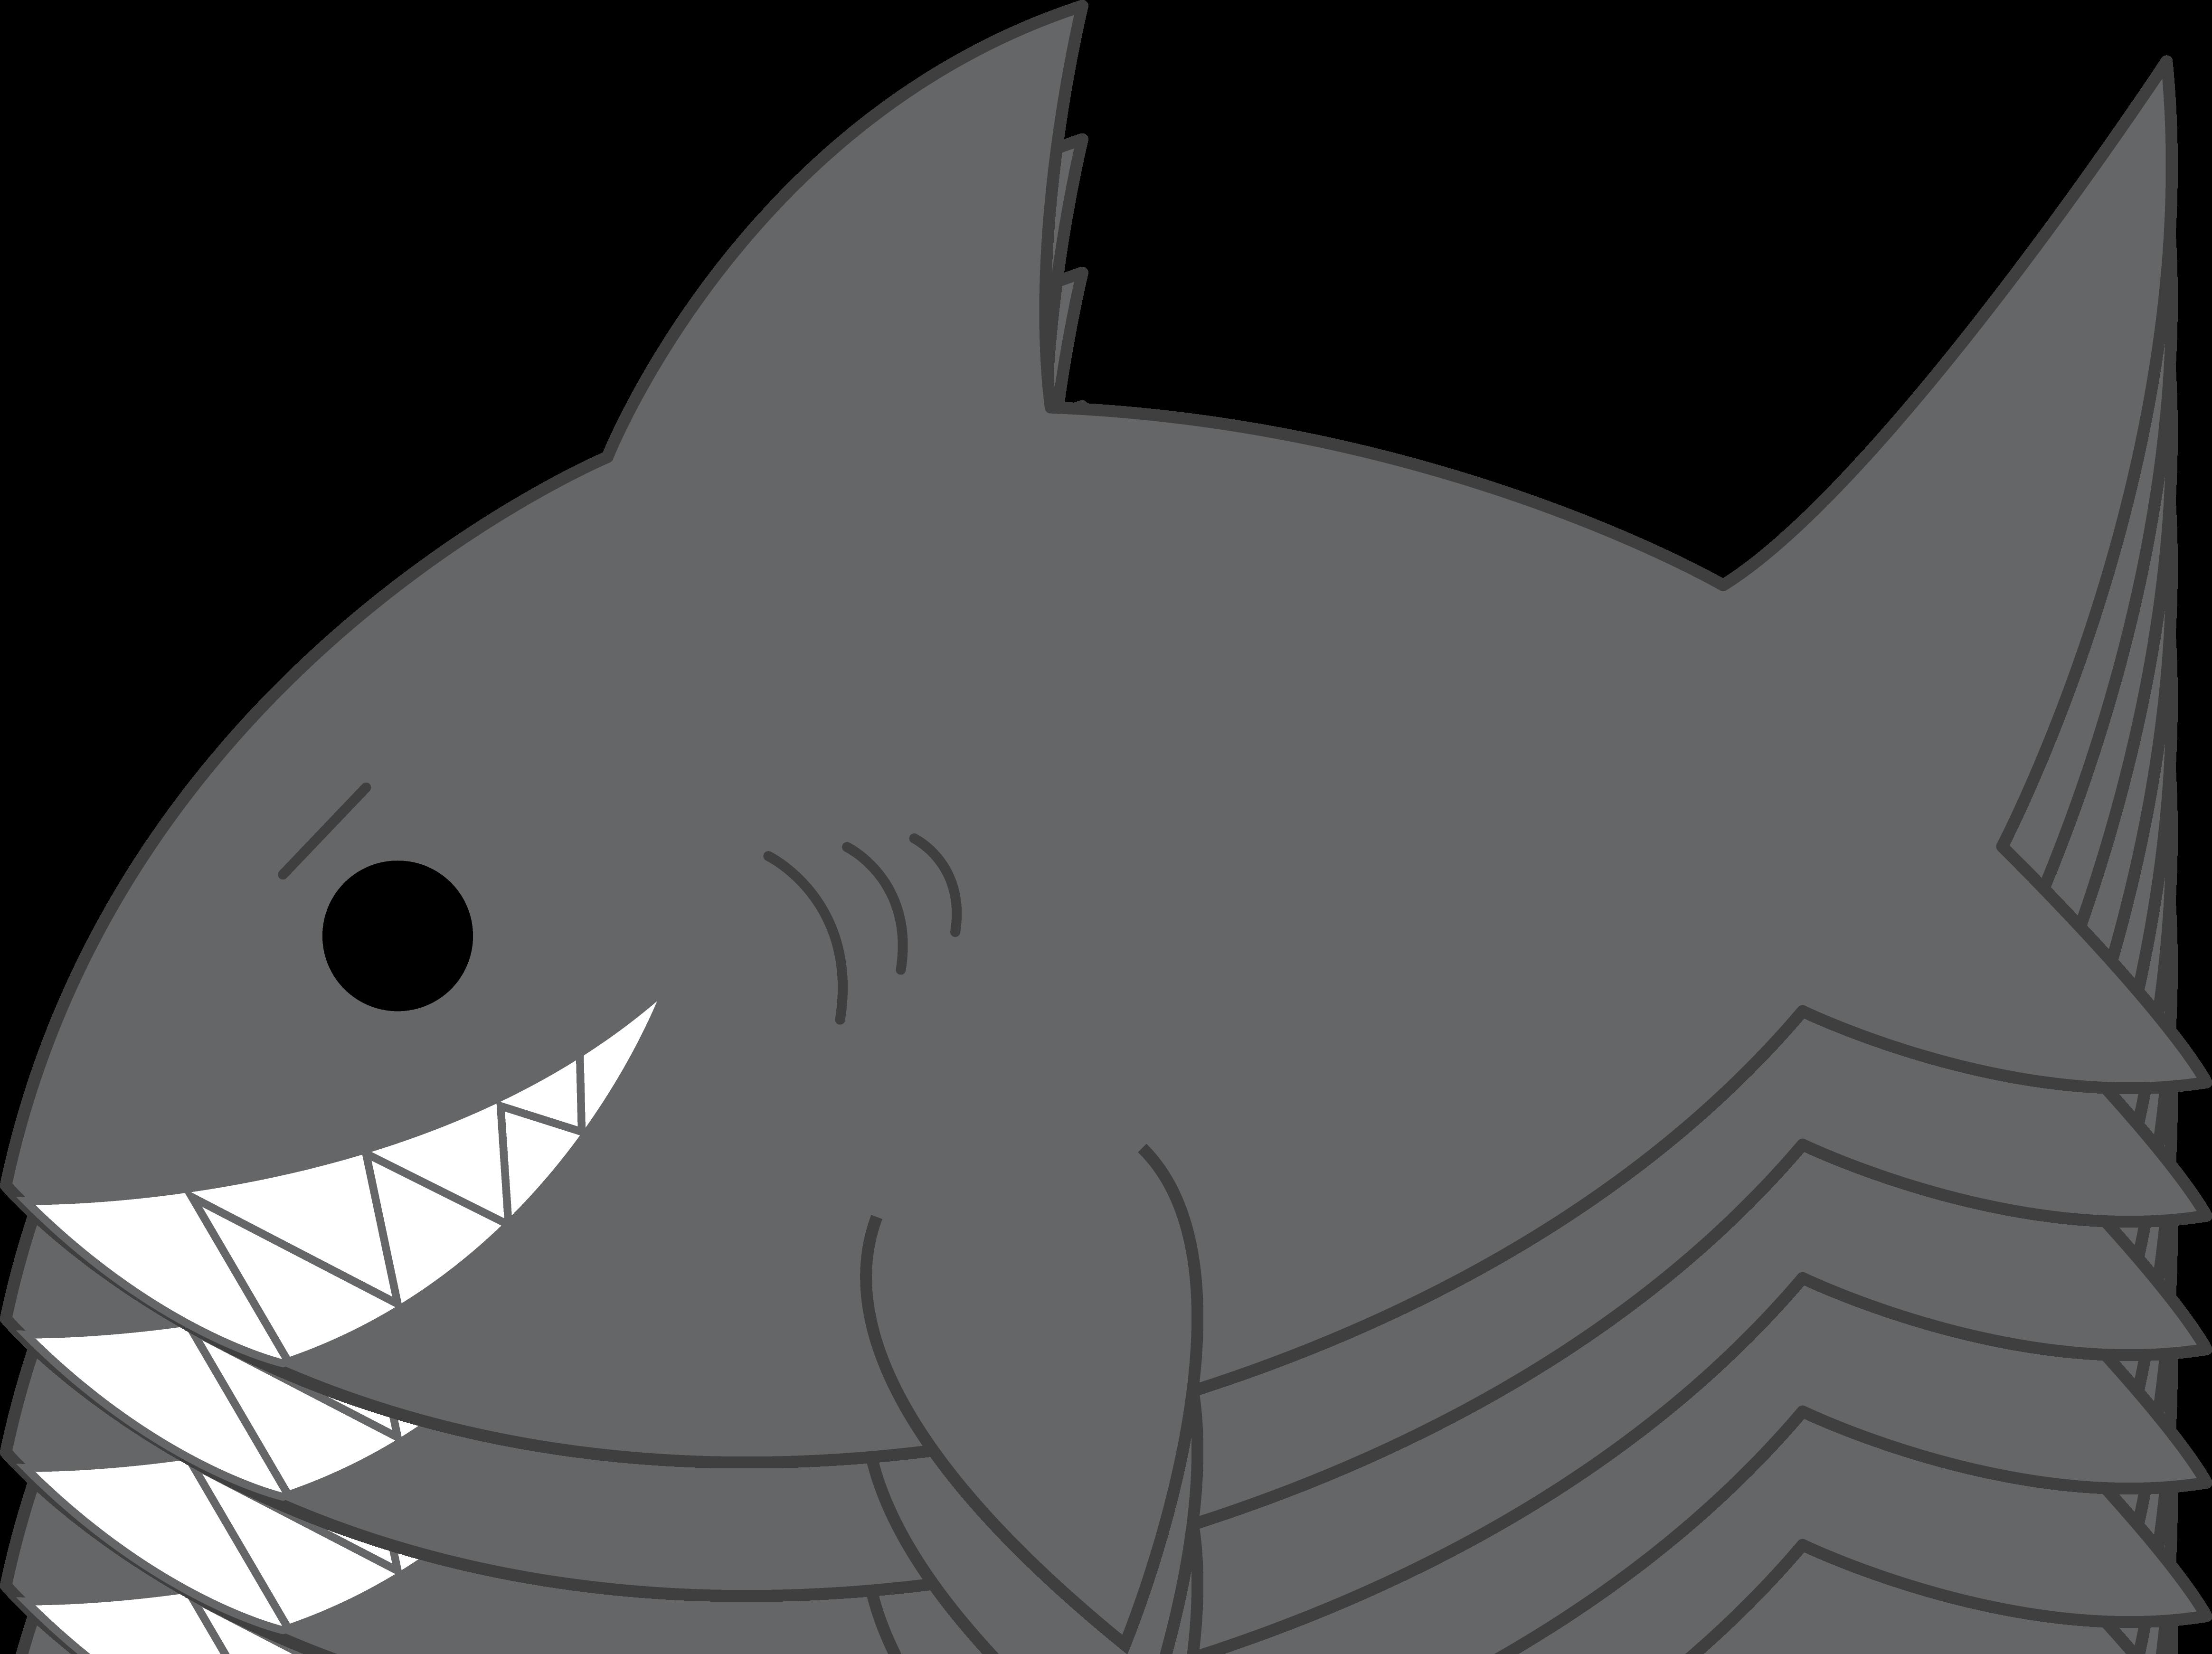 shark clip art images clipart panda free clipart images rh clipartpanda com free shark clipart download baby shark clipart free